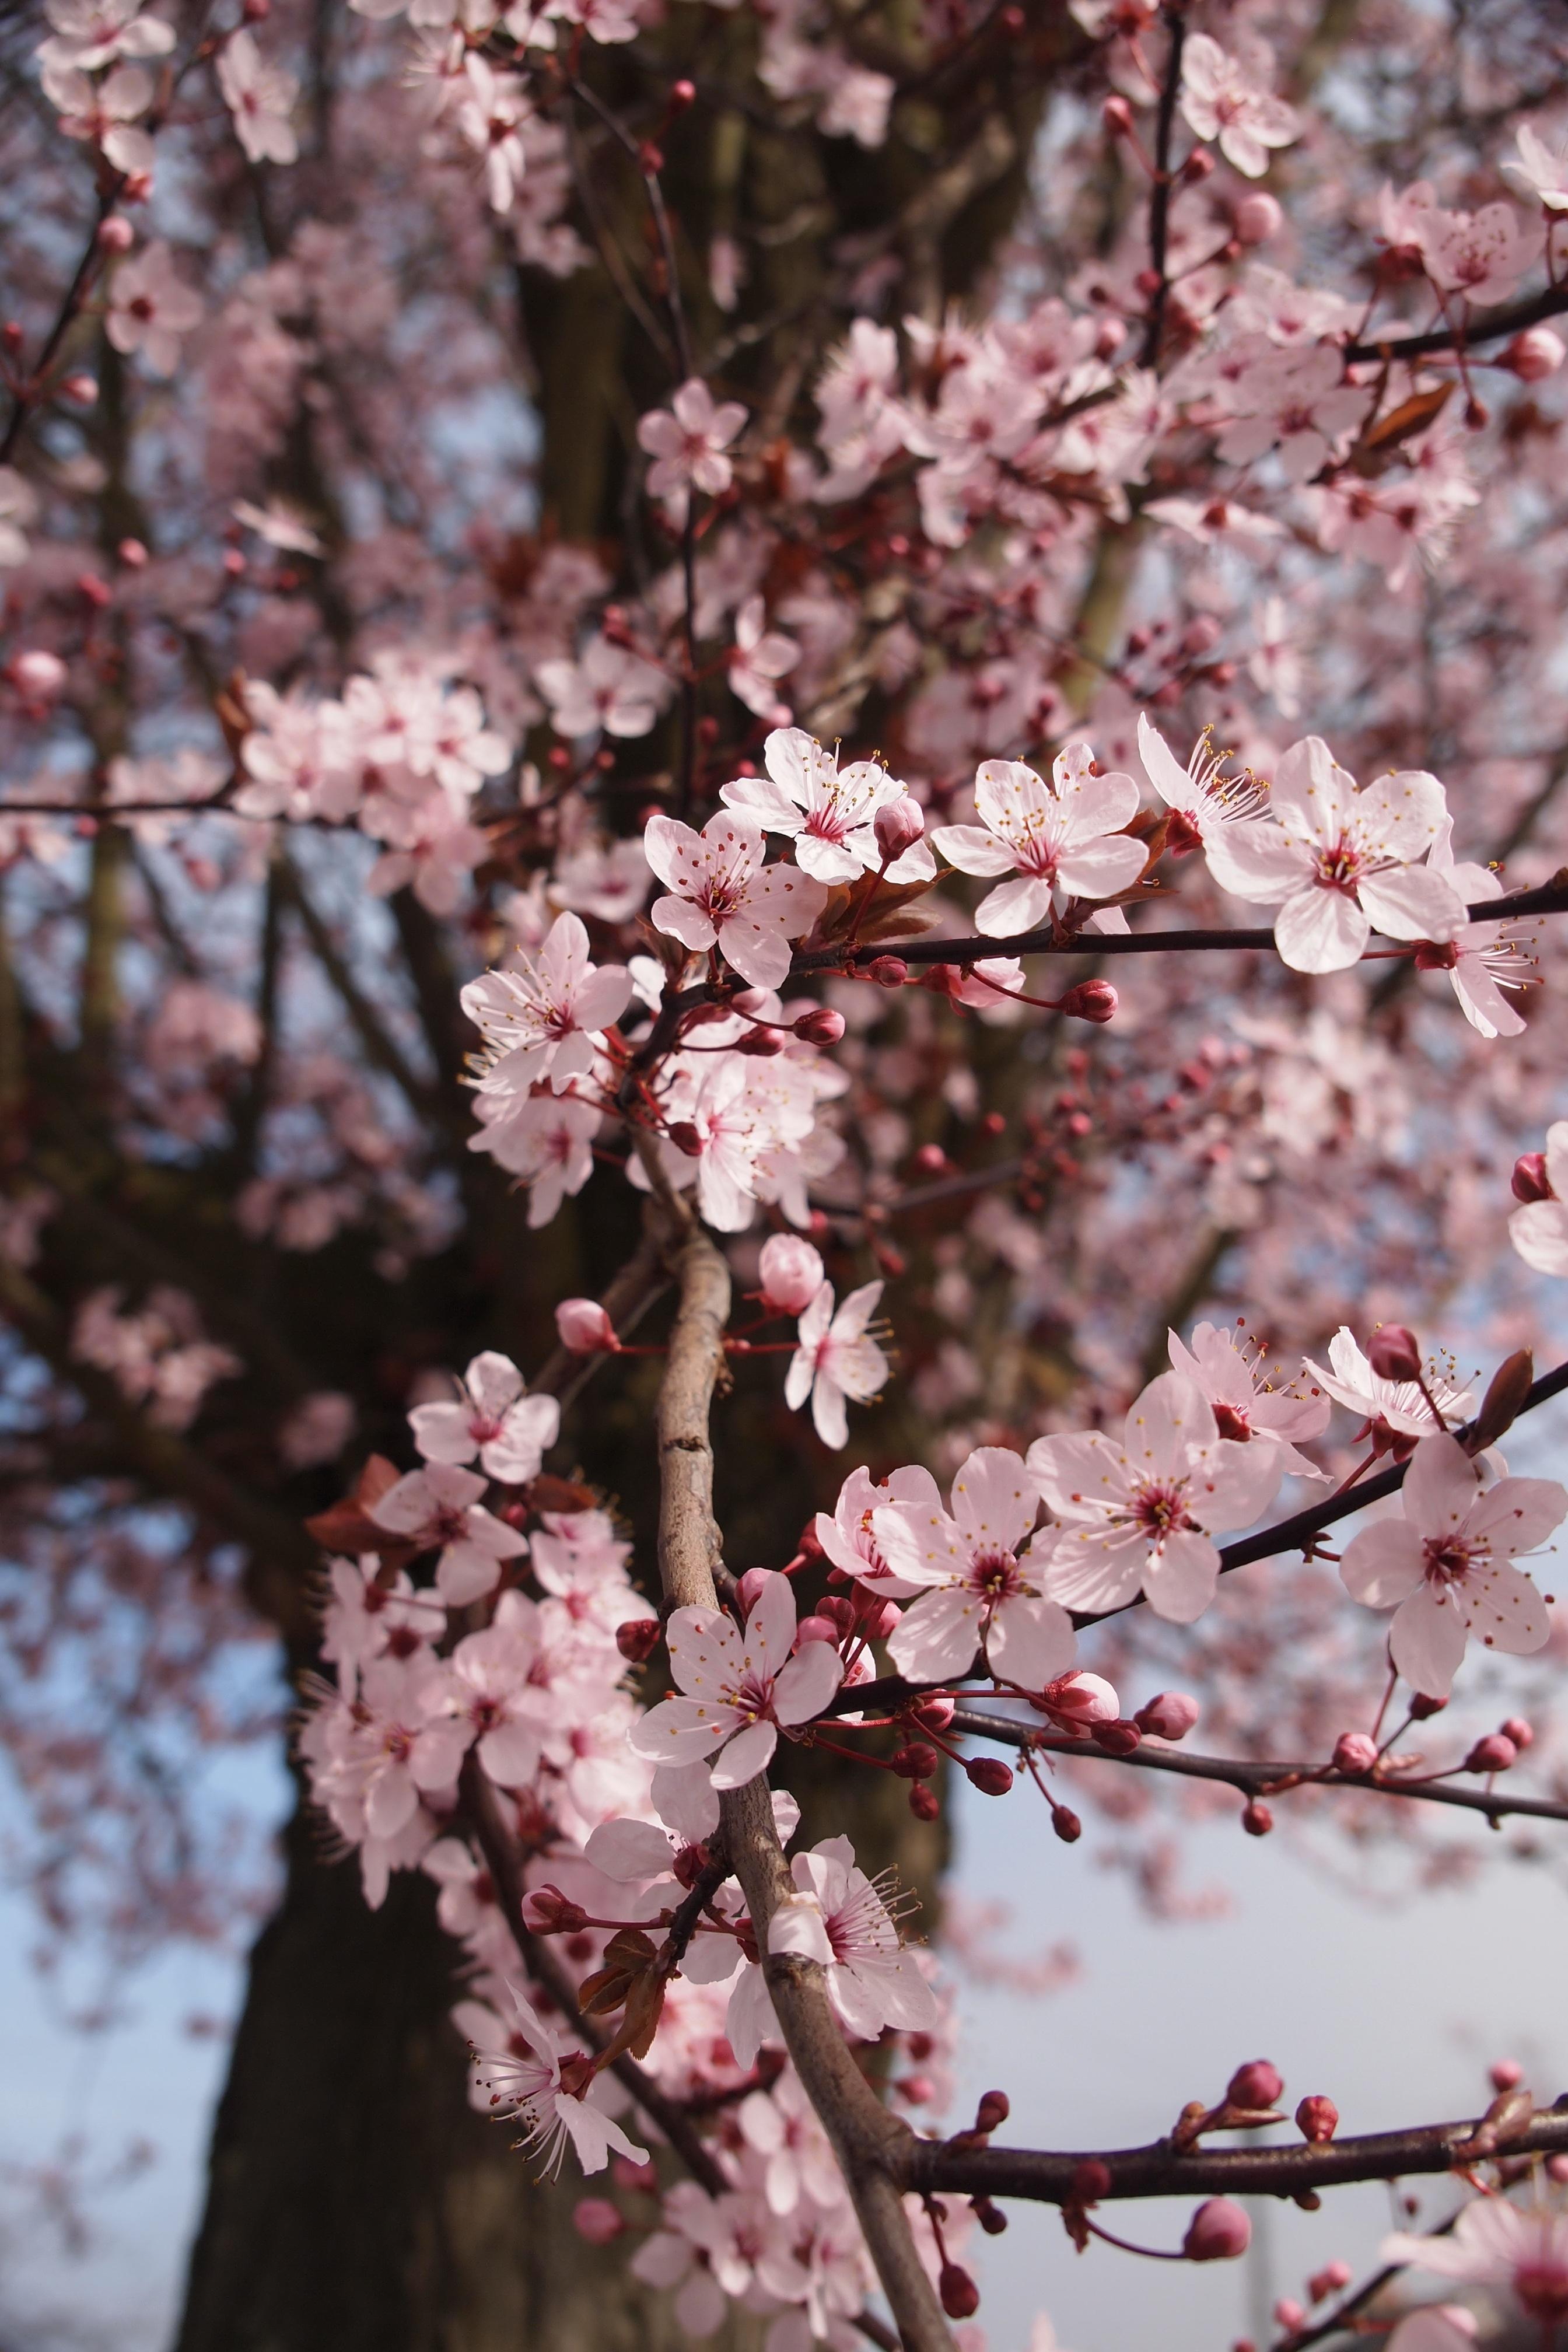 Free Images Tree Branch Flower Petal Food Spring